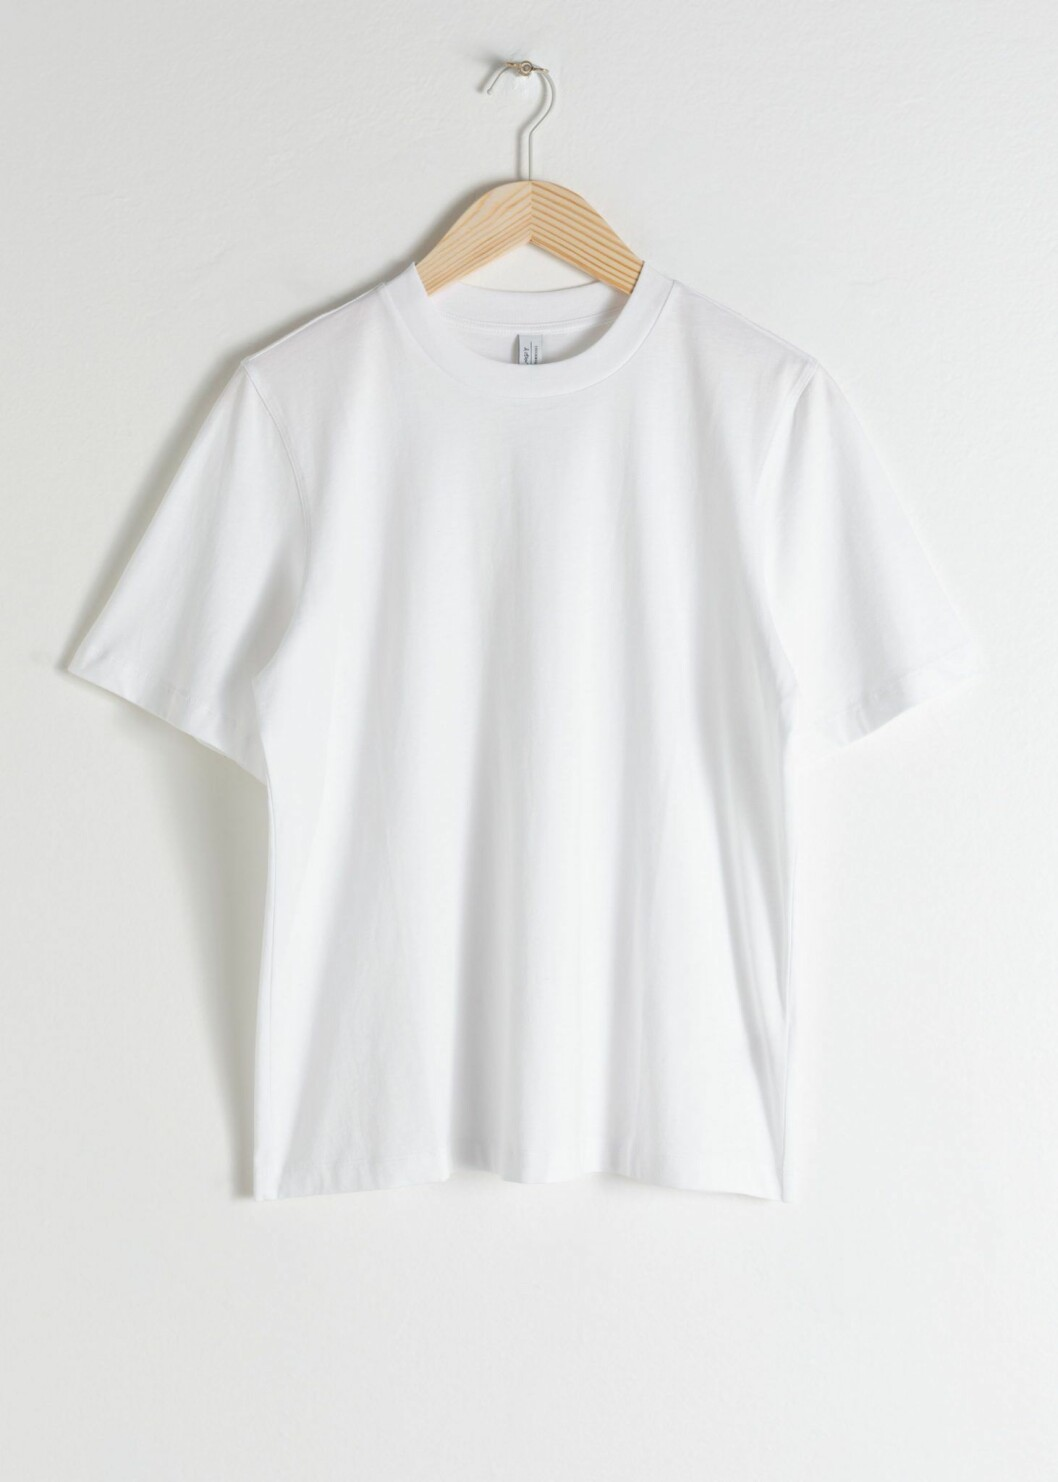 Vit T-shirt från & other stories.